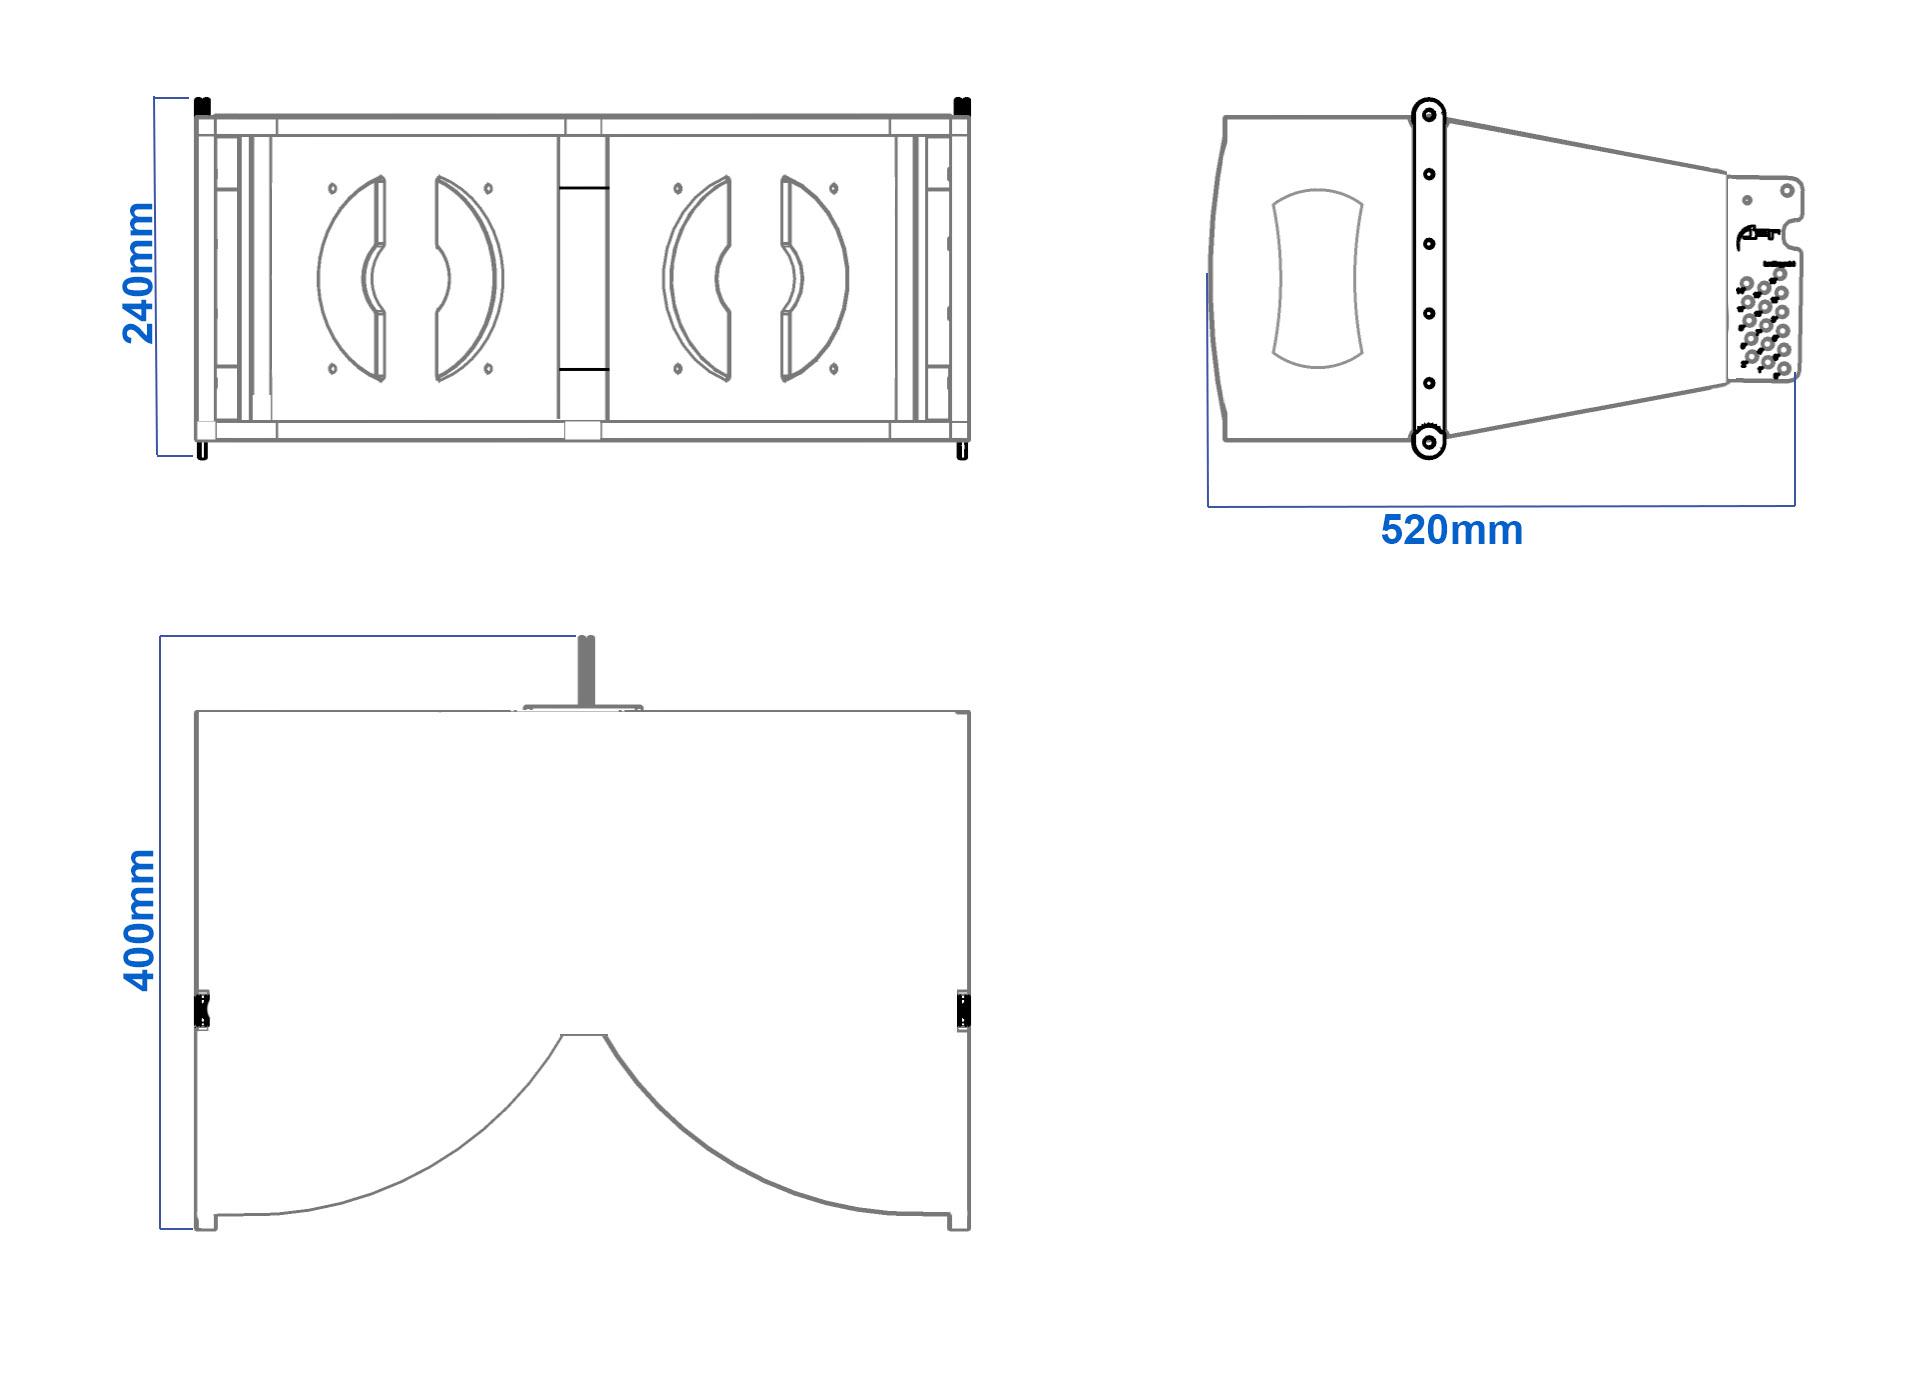 wiring diagram 2000 ford expedition eddie bauer html